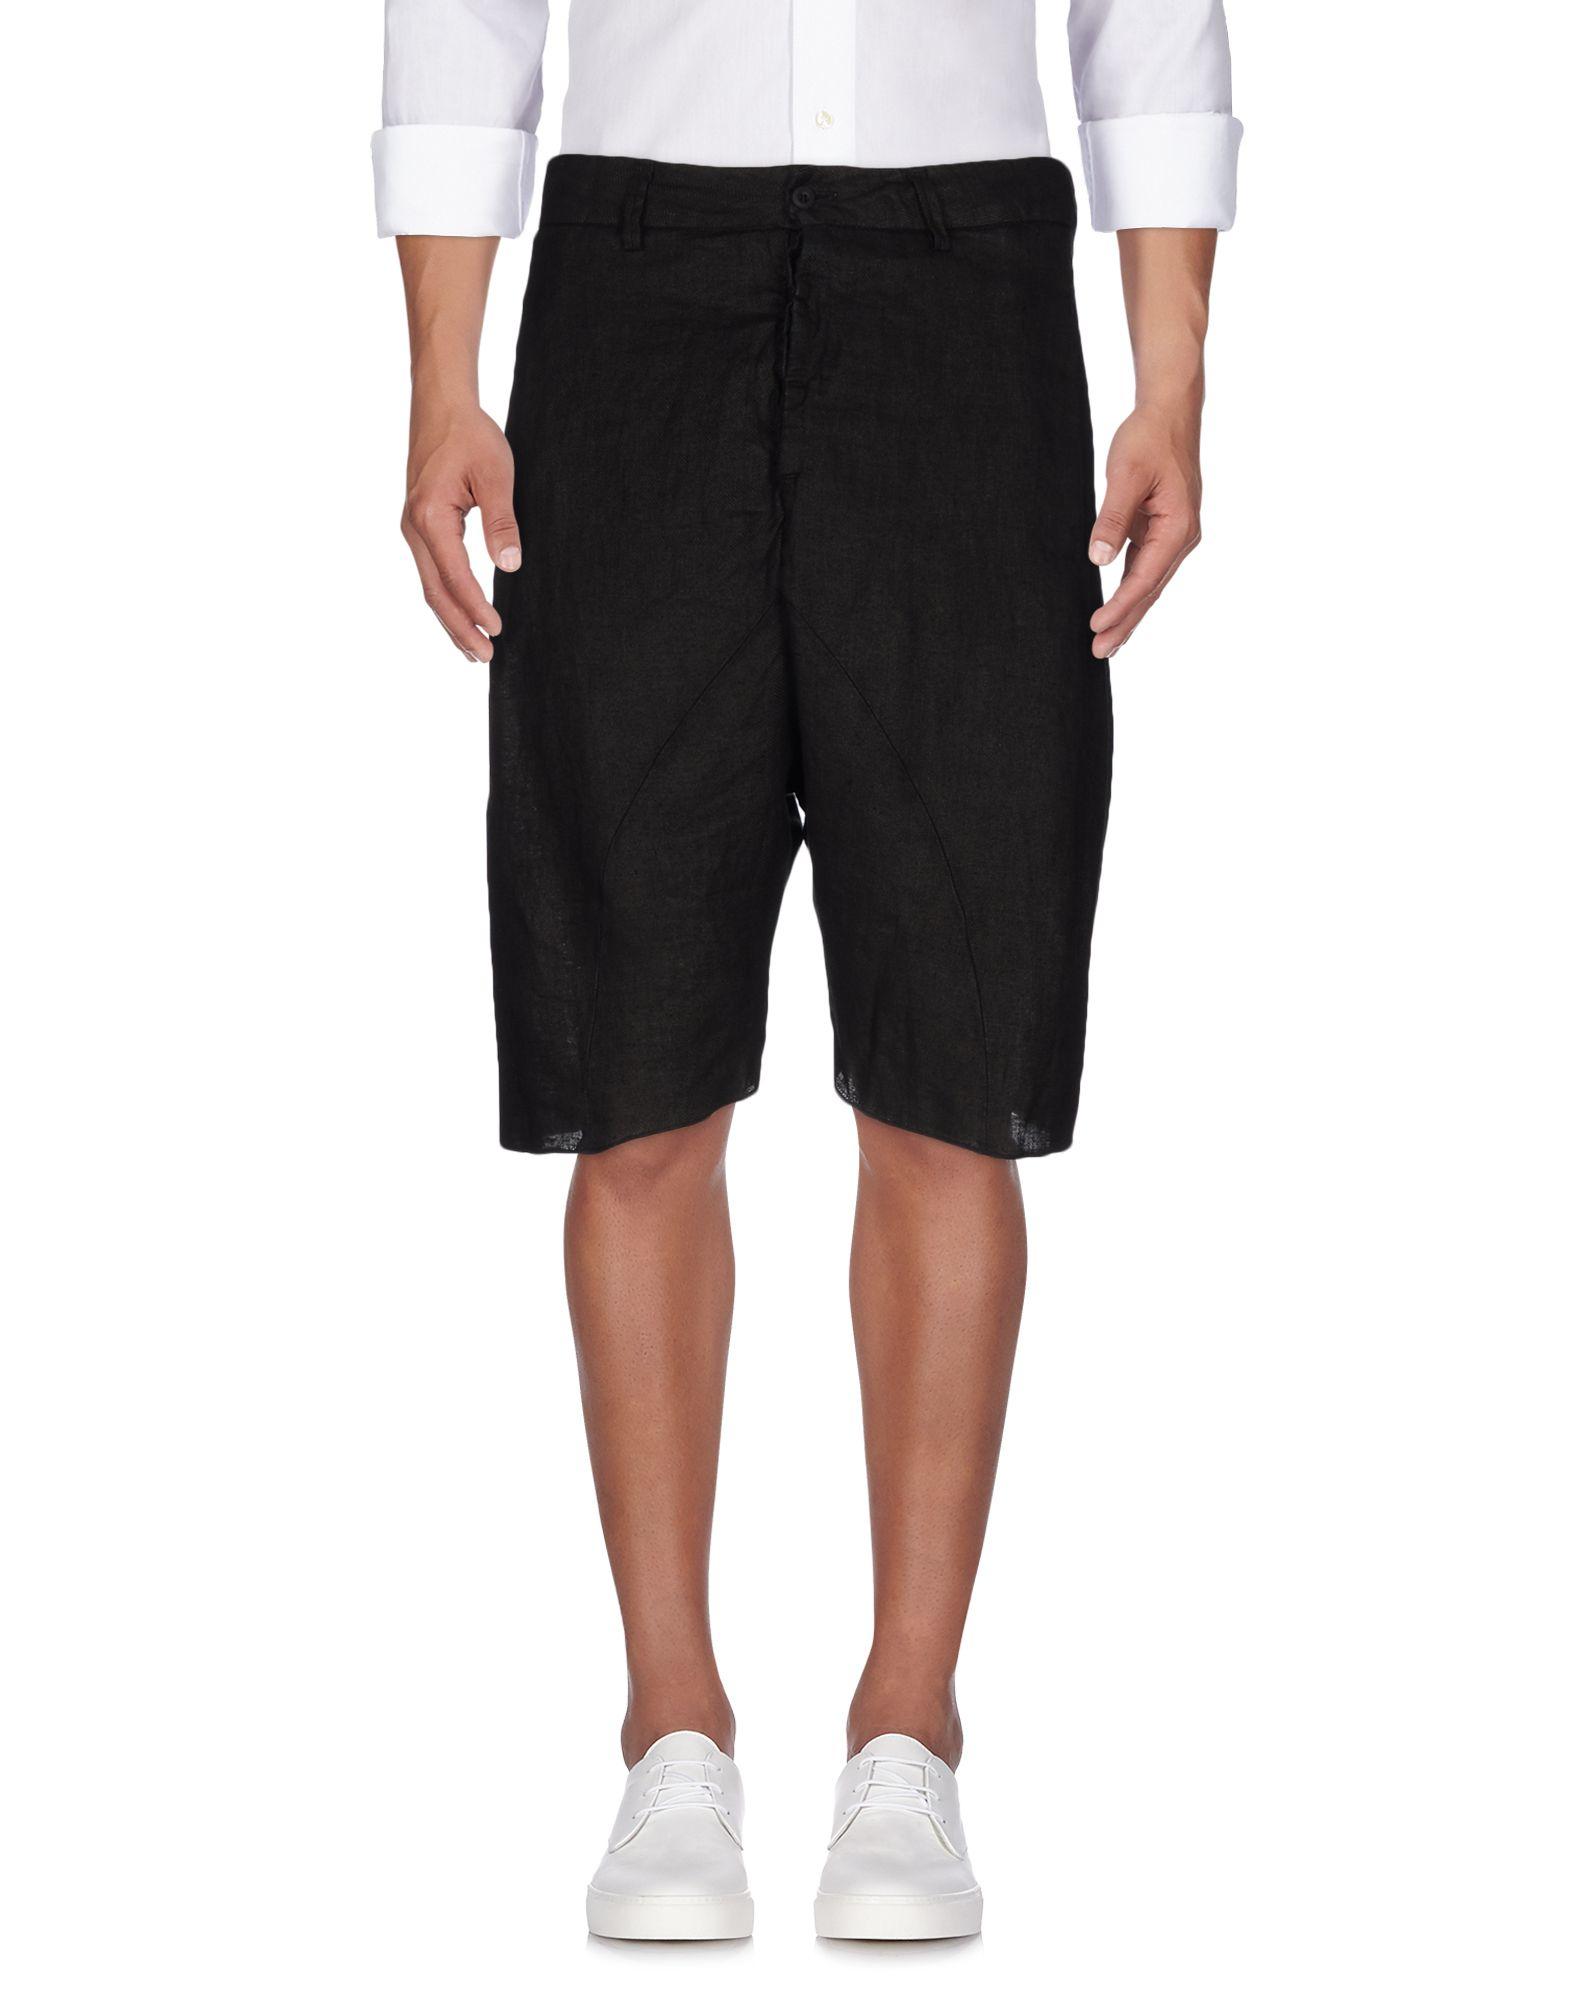 TROUSERS - Bermuda shorts Les Boh Ys2qnUAqyY